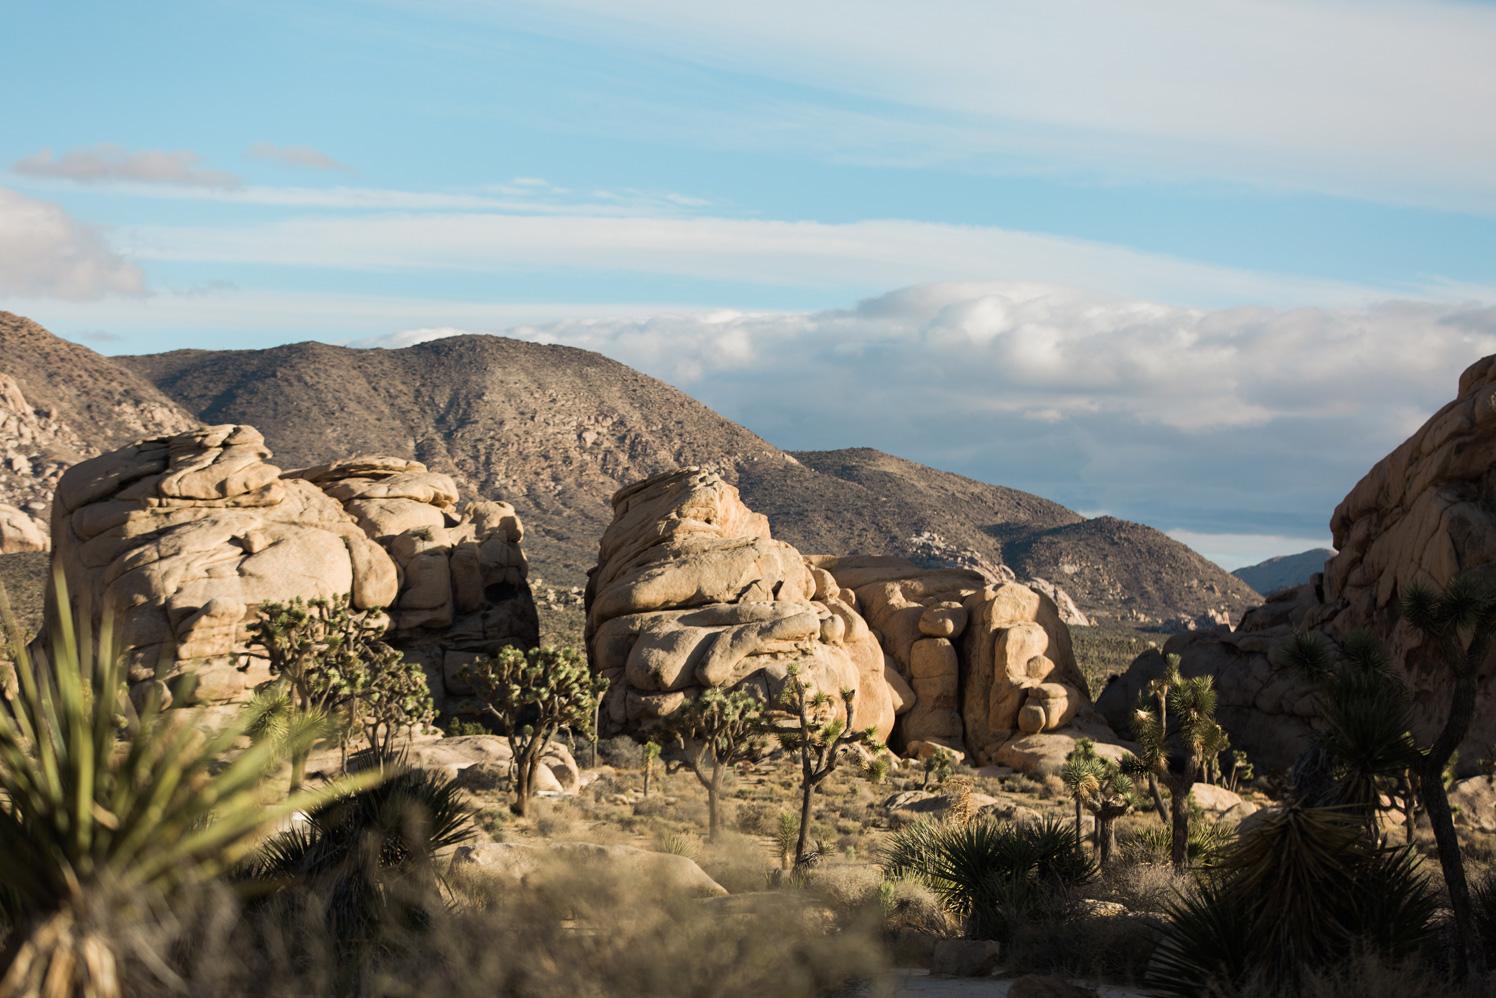 CindyGiovagnoli_Joshua_Tree_National_Park_California_Mojave_Desert_Cholla_Garden_Hidden_Valley_climbing_hiking_camping-006.jpg